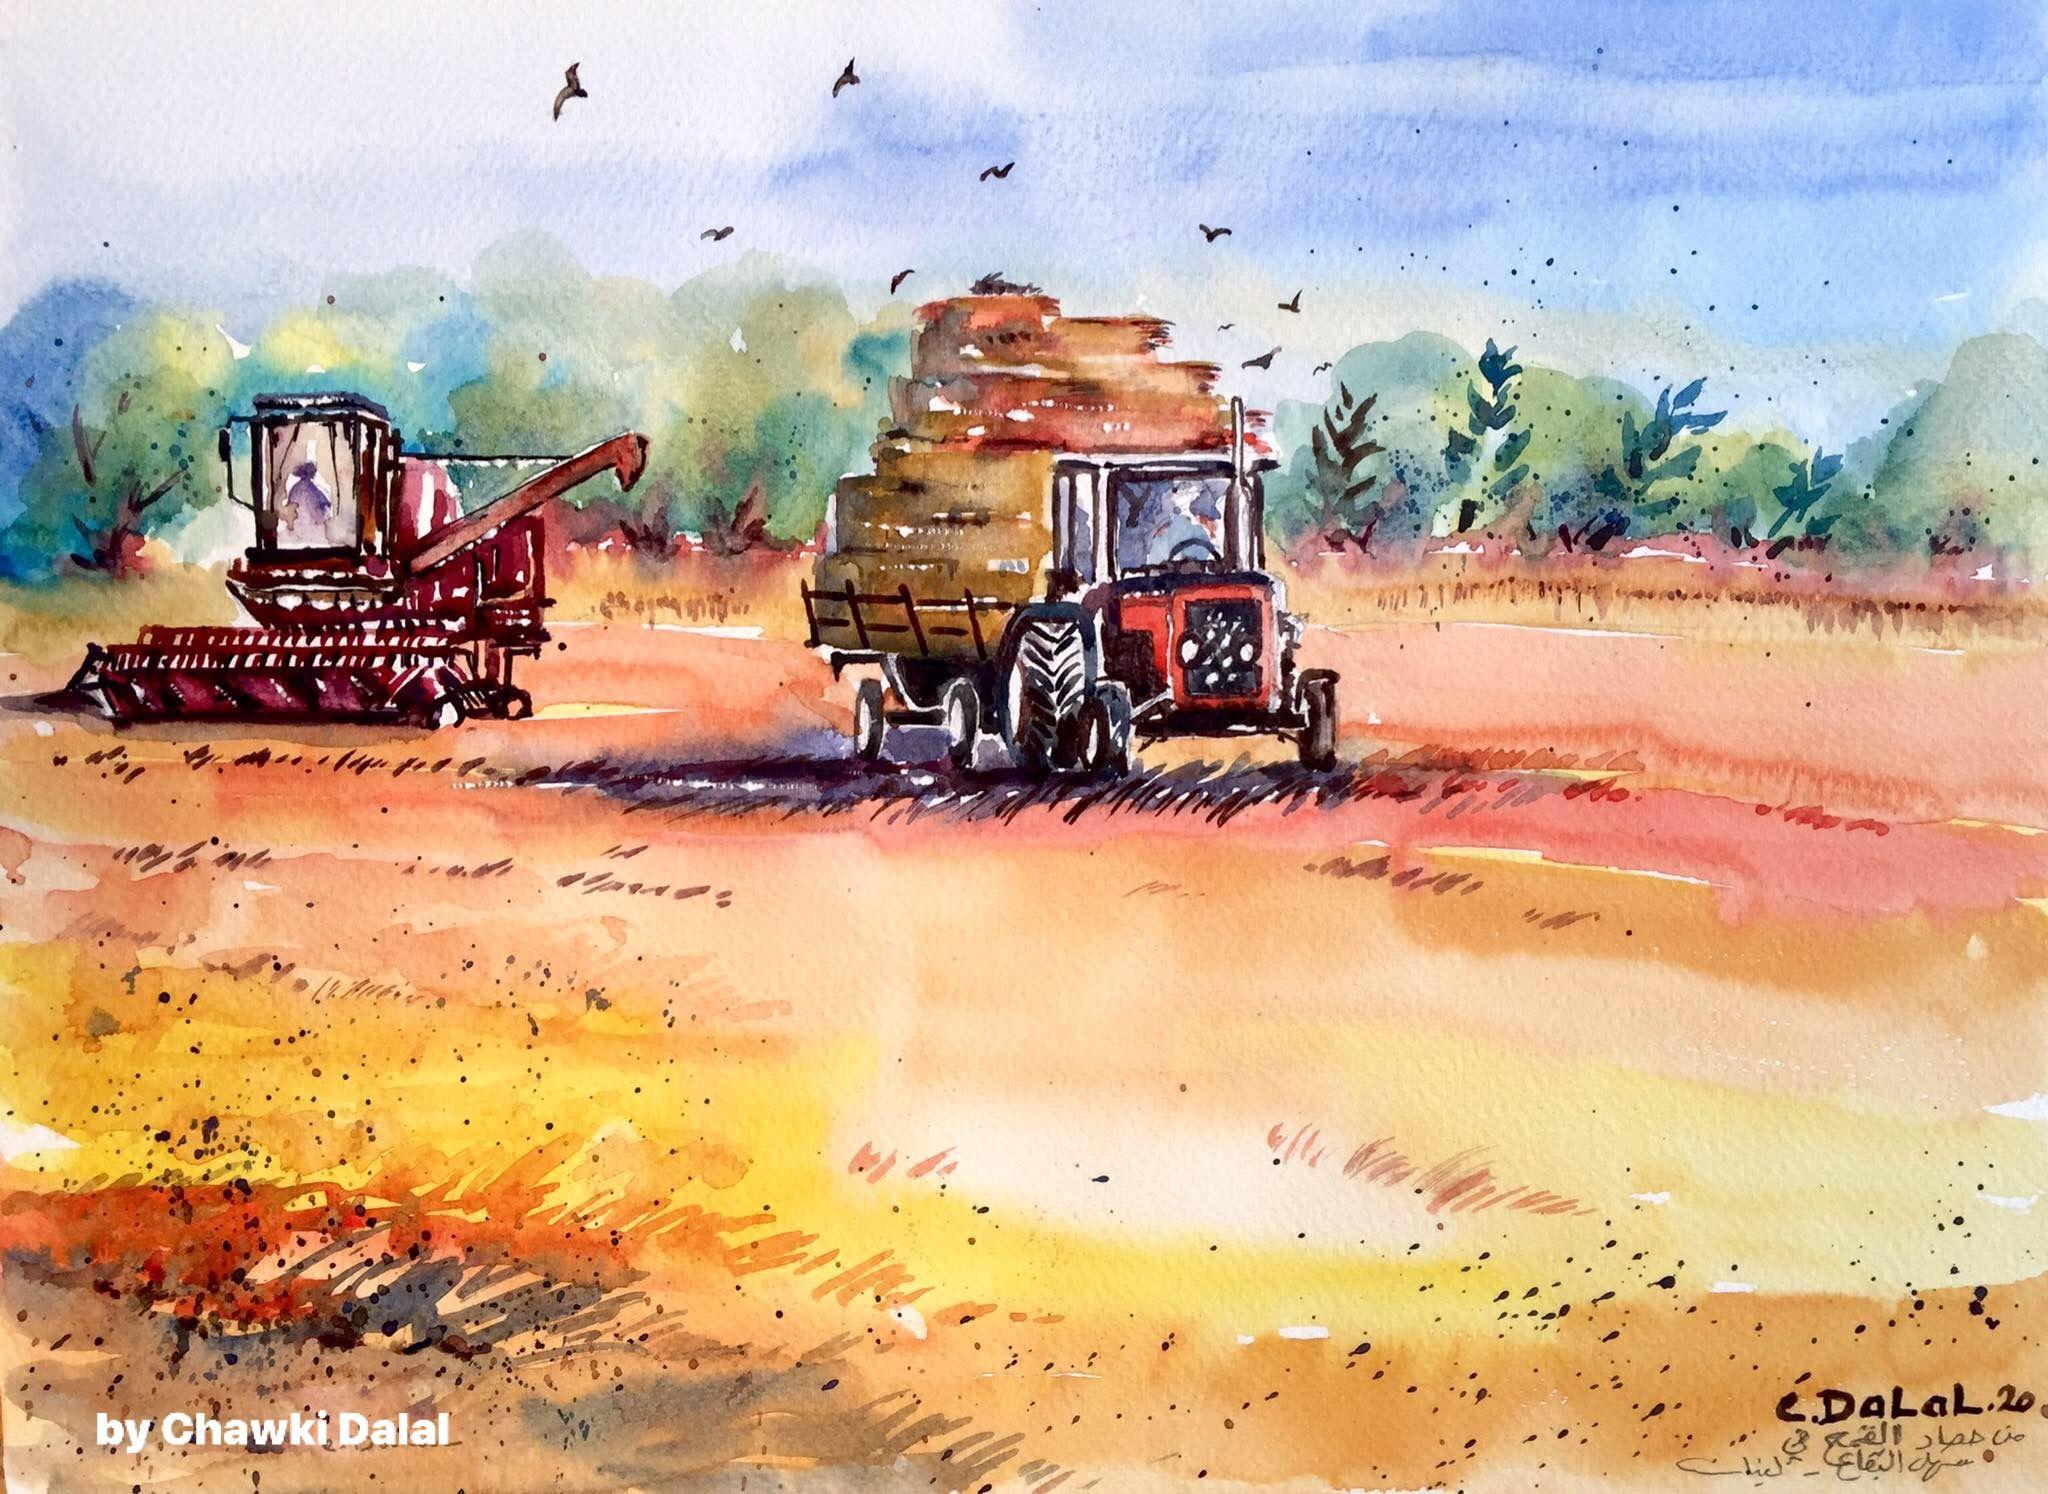 Watercolor Painting By Chawki Dalal Lebanon From The Wheat Harvest In Ammiq Valley At West Bekaa Lebanon لوحة جديدة بريشتي من موسم حصاد القمح Art Painting